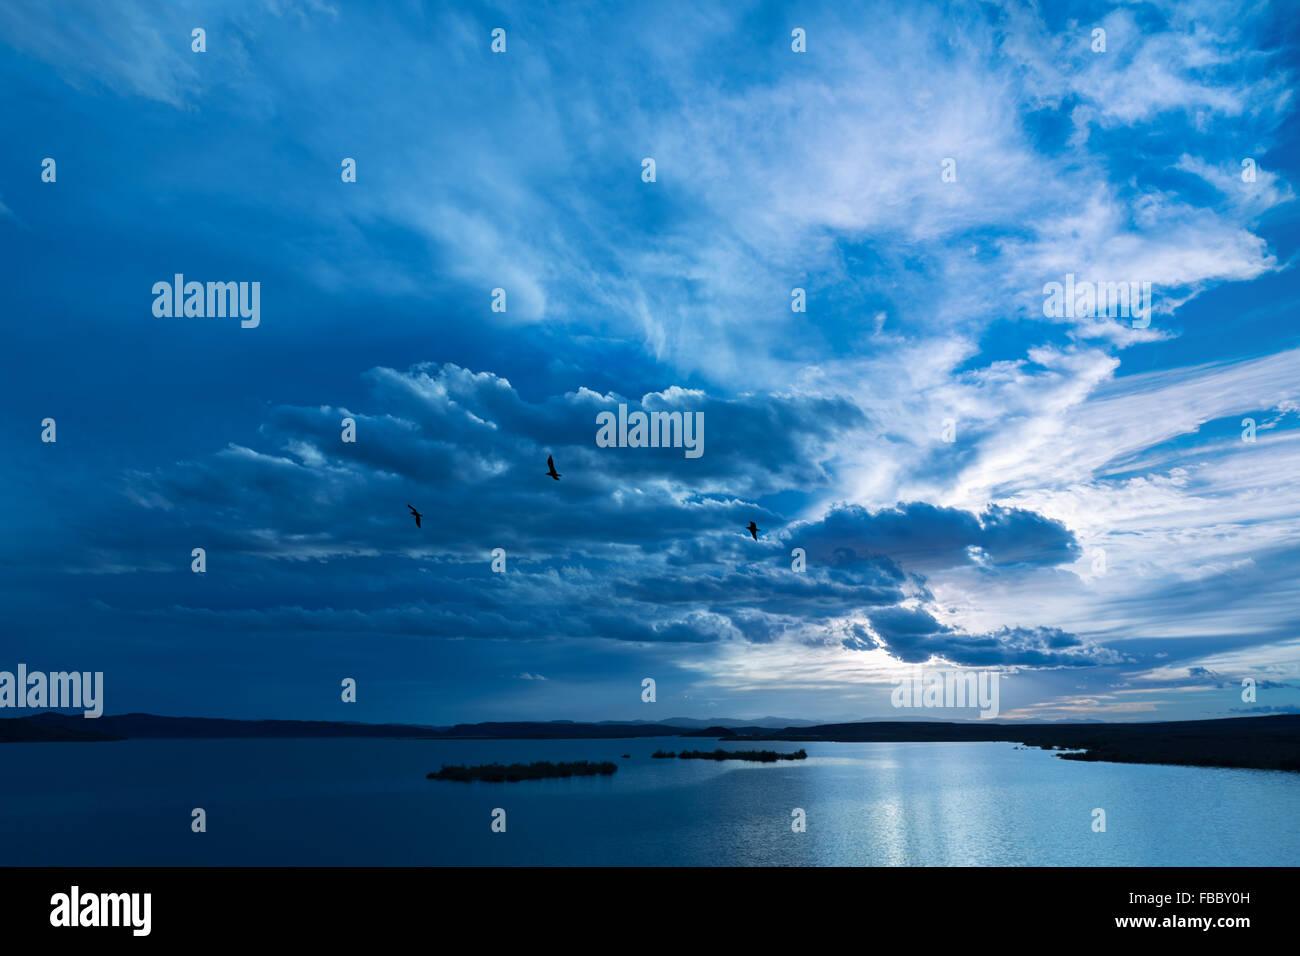 Vögel fliegen gegen dunkel bewölkter Himmel über dem Wasser. Stockbild